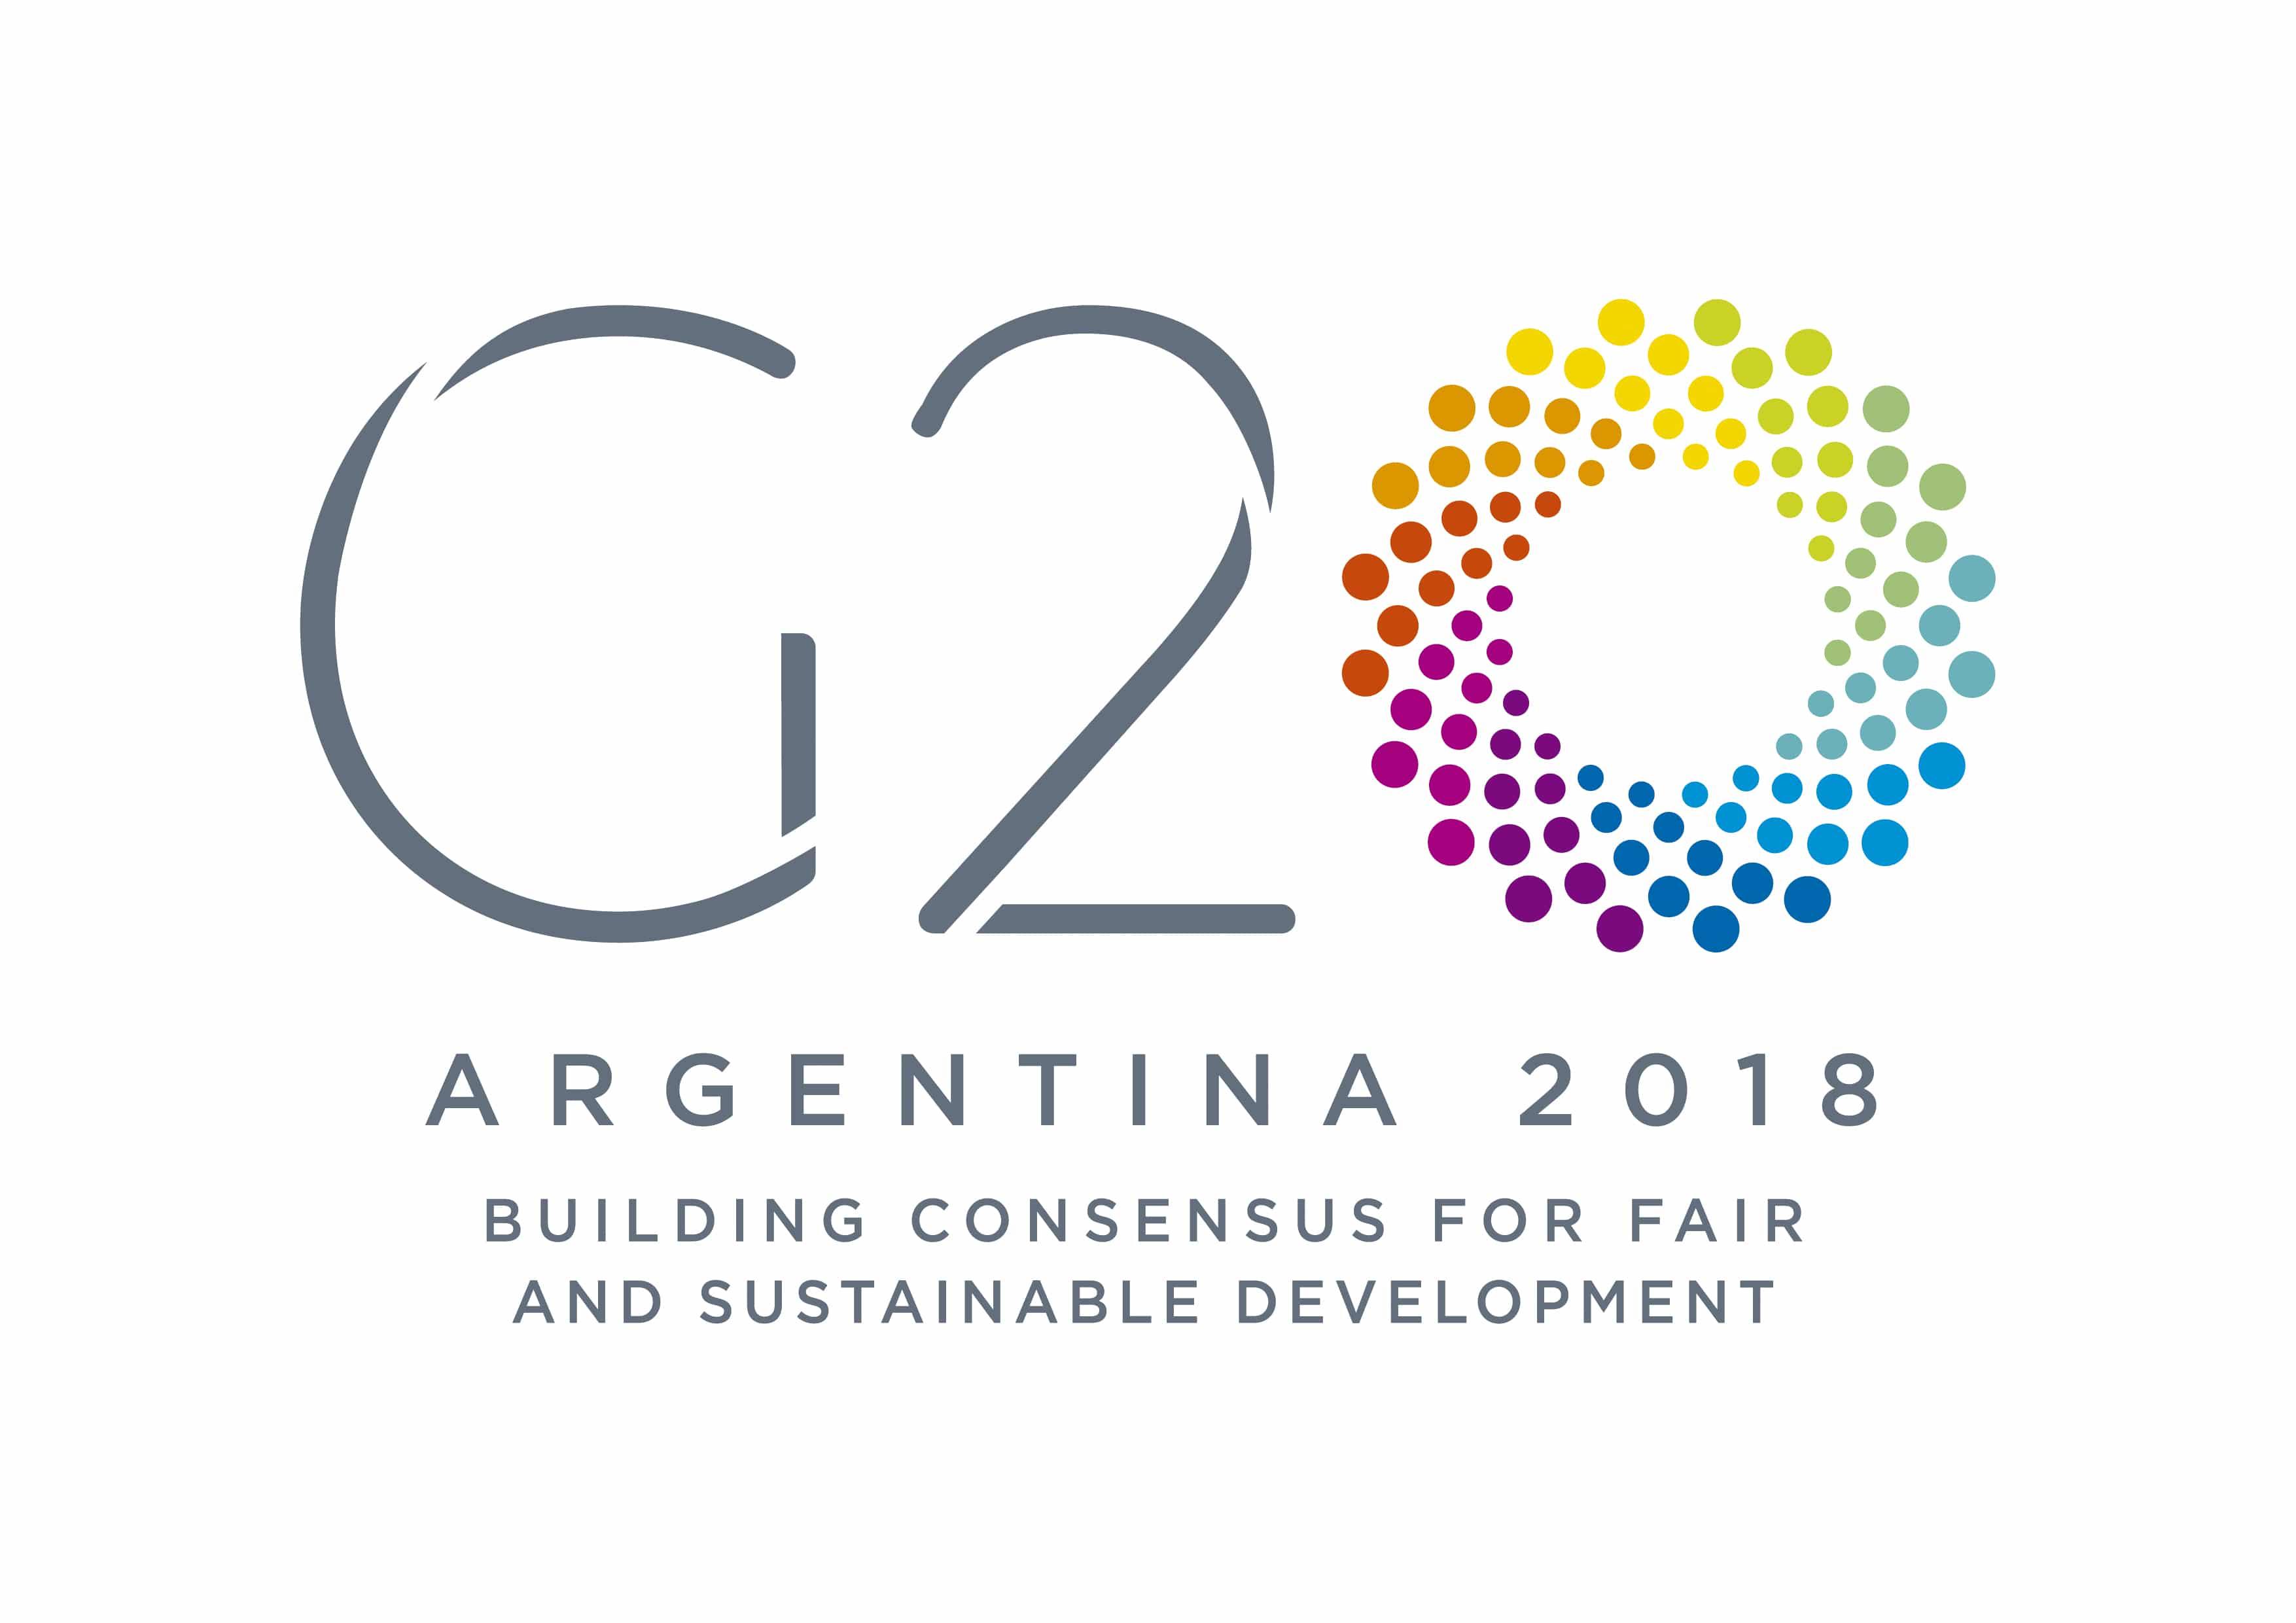 G20 environnement 2018